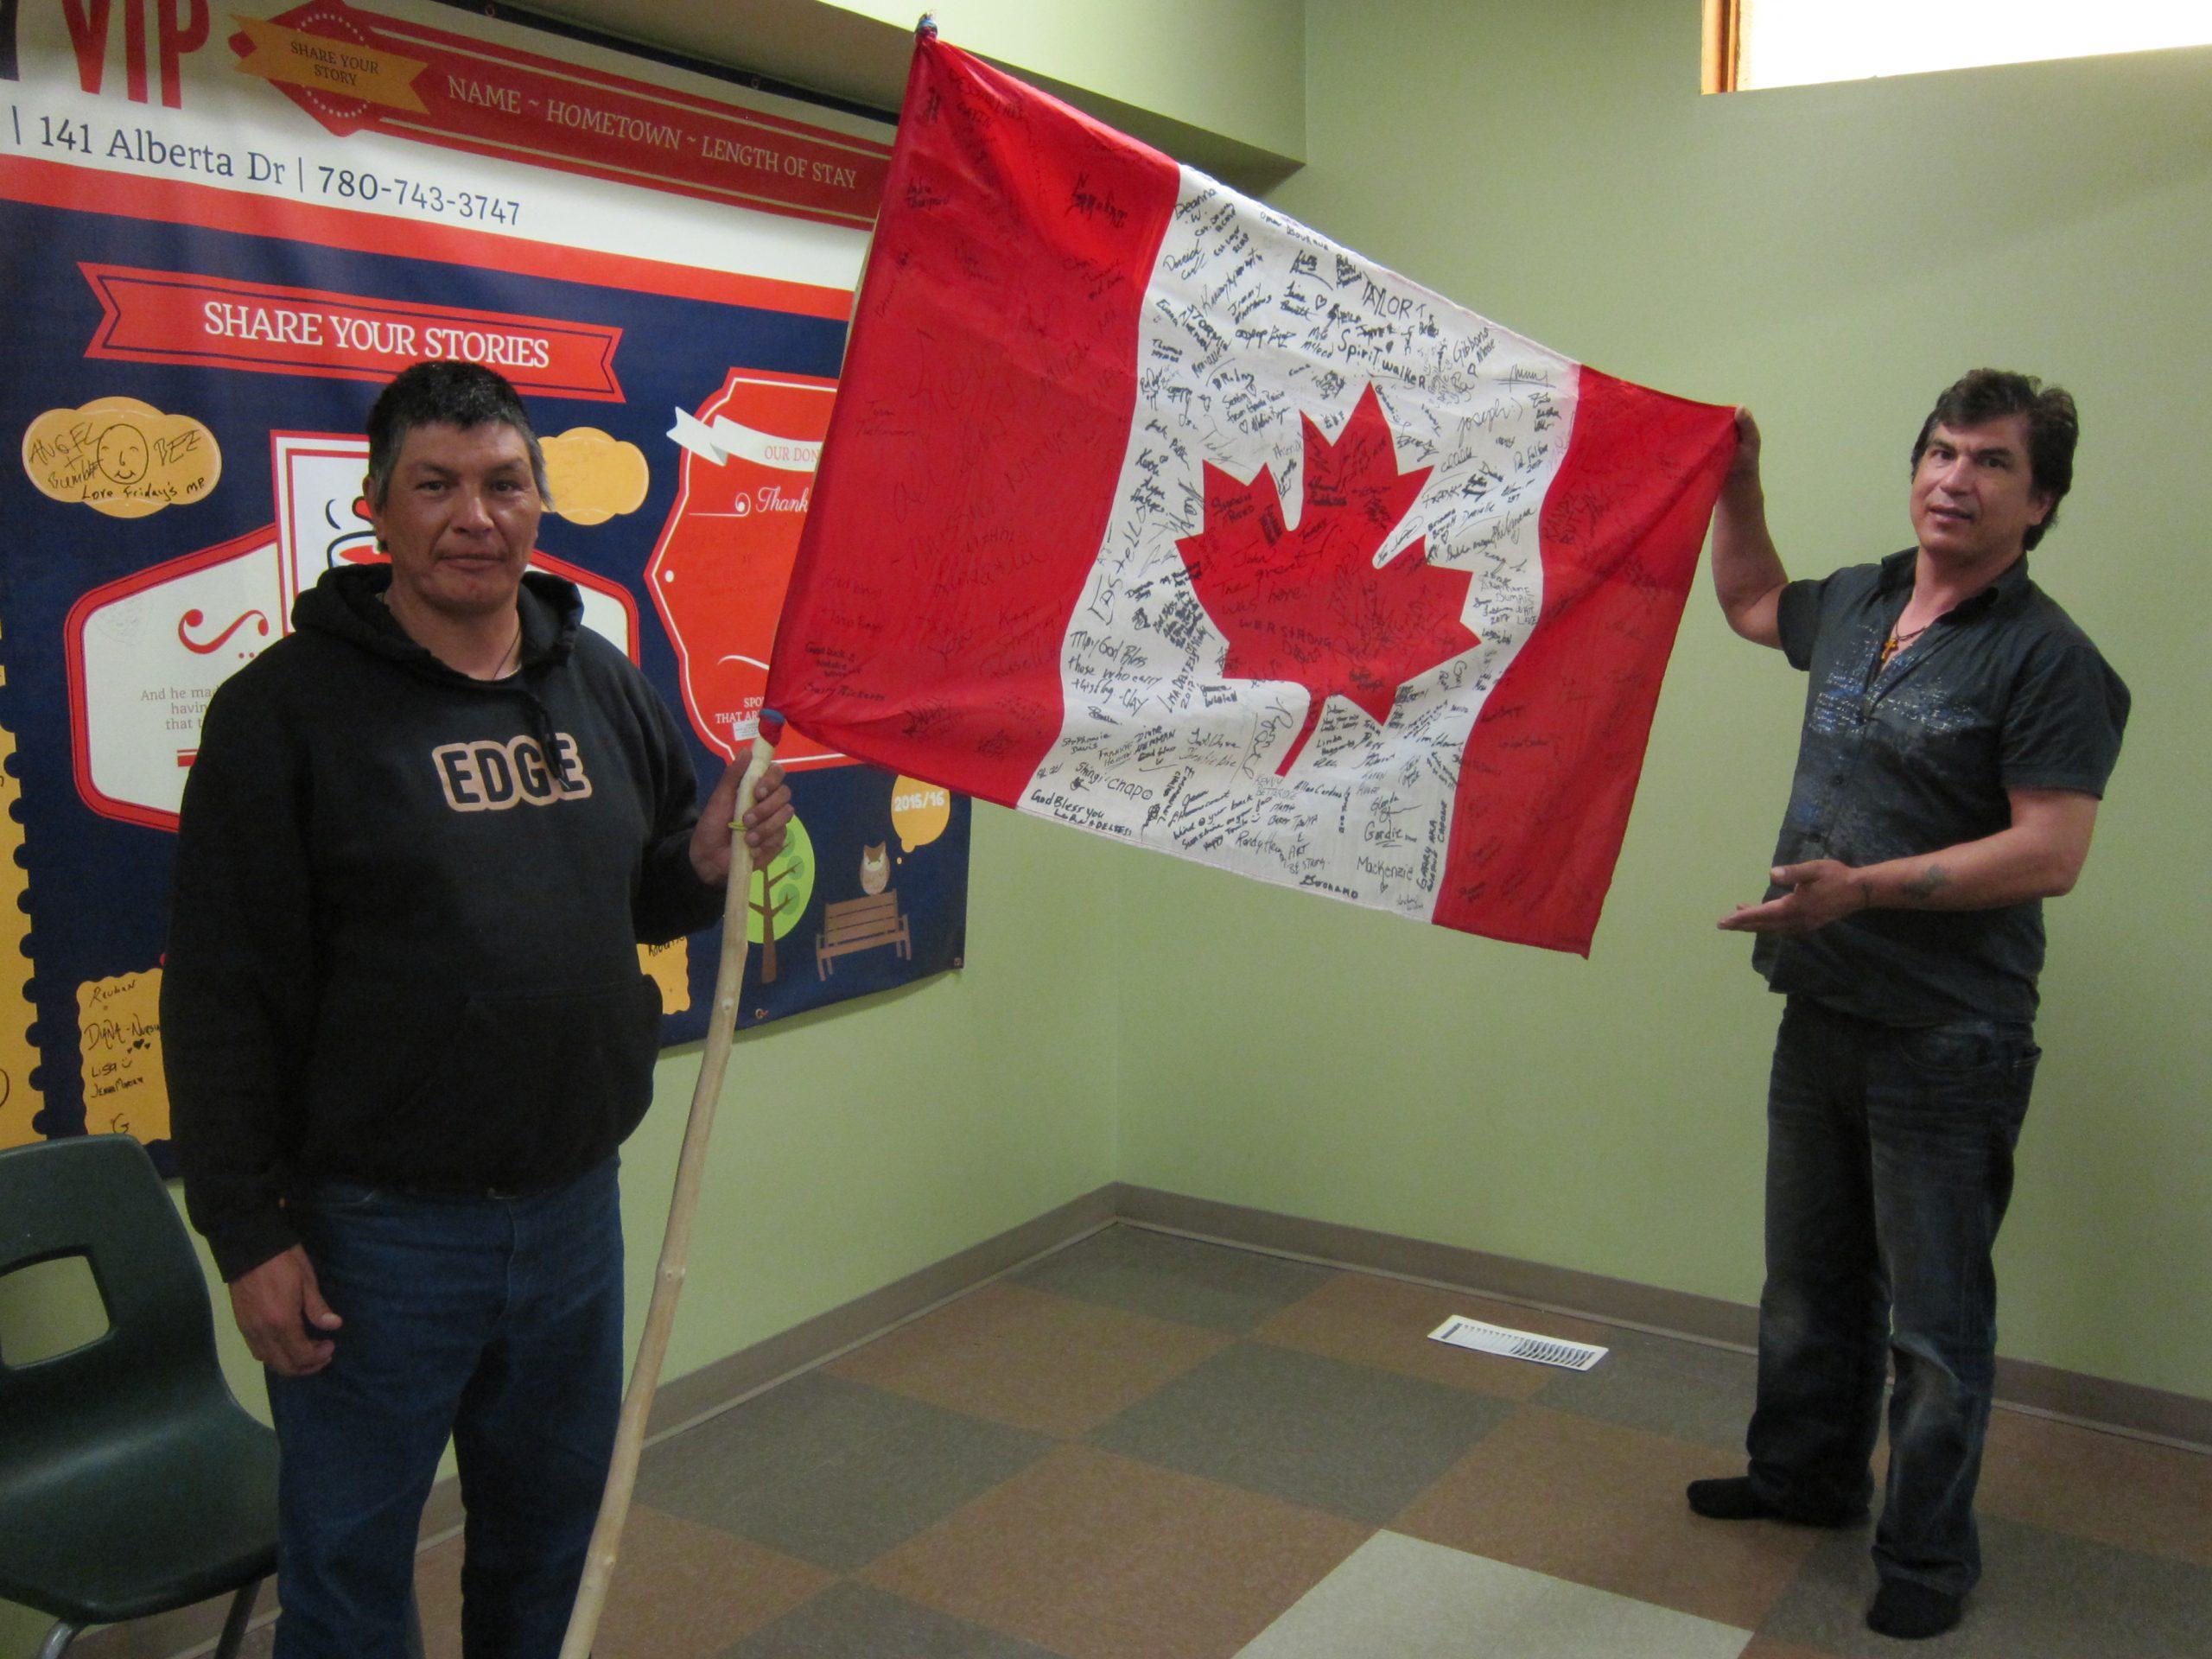 Local Man Walking Across Canada Raising Awareness for Homeless and Missing Aboriginal People